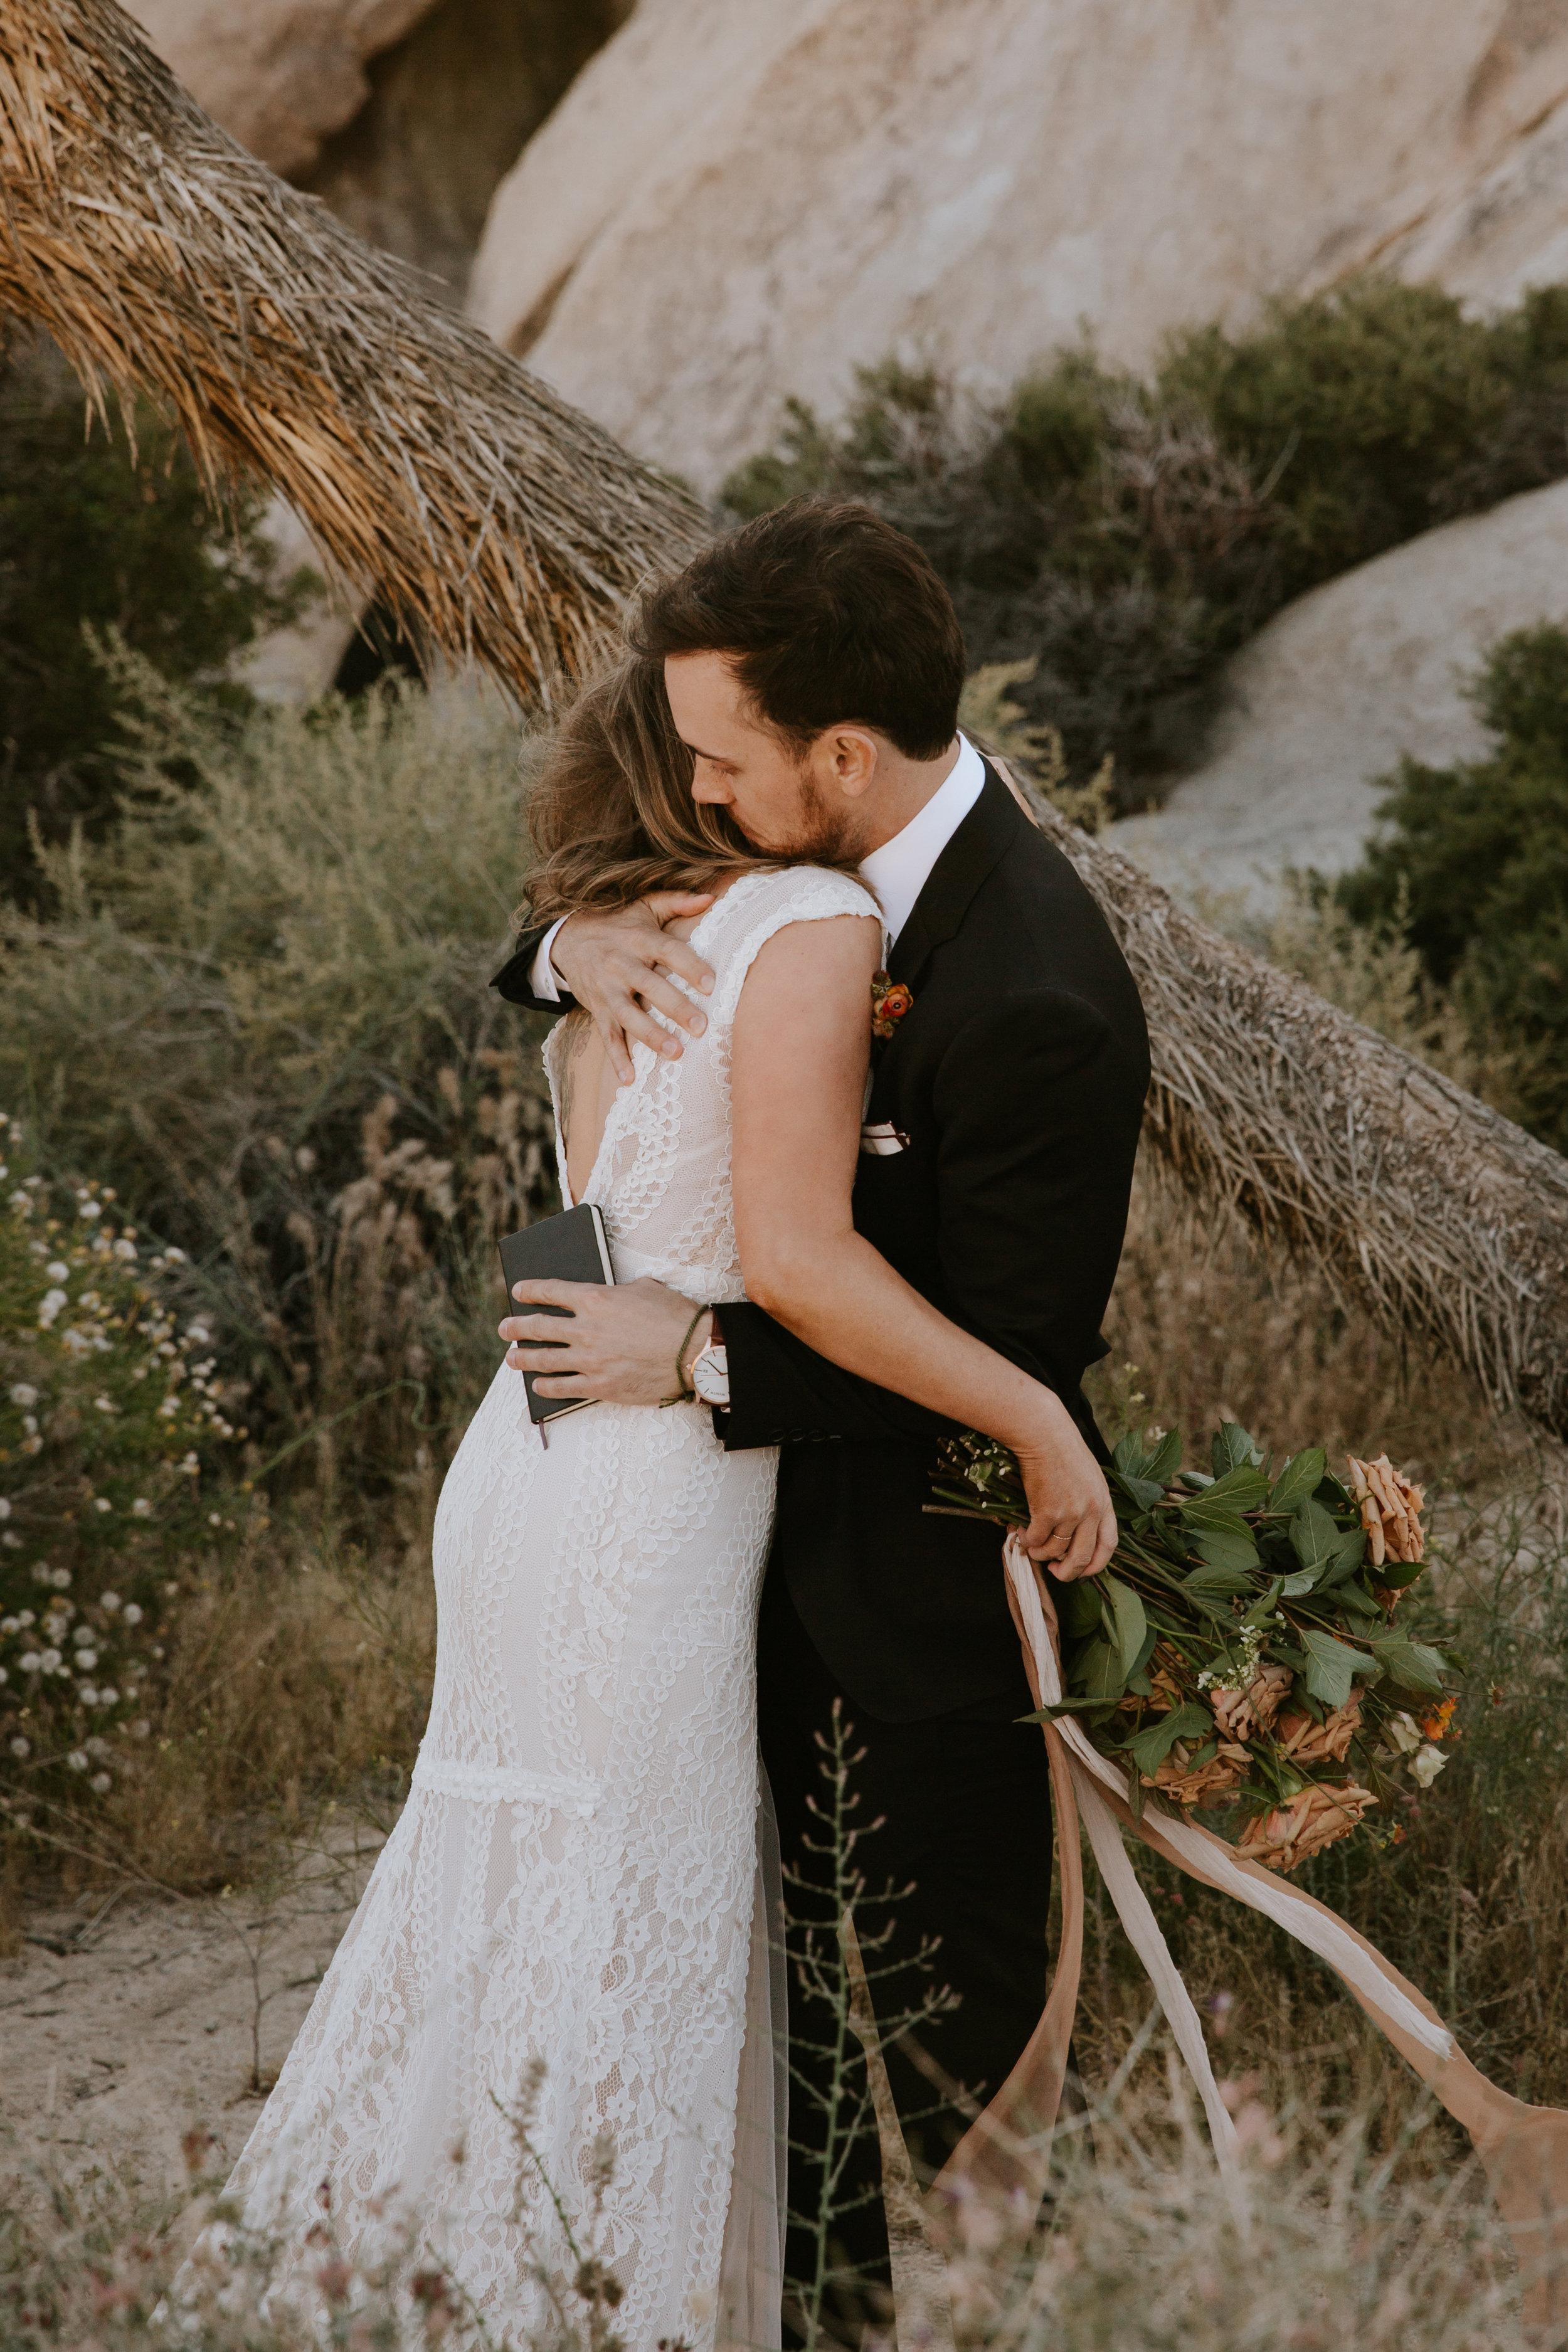 2019-05-26_Callie-Evan_Wedding_Joshua Tree_Paige Nelson_PREVIEWS HR-34.jpg